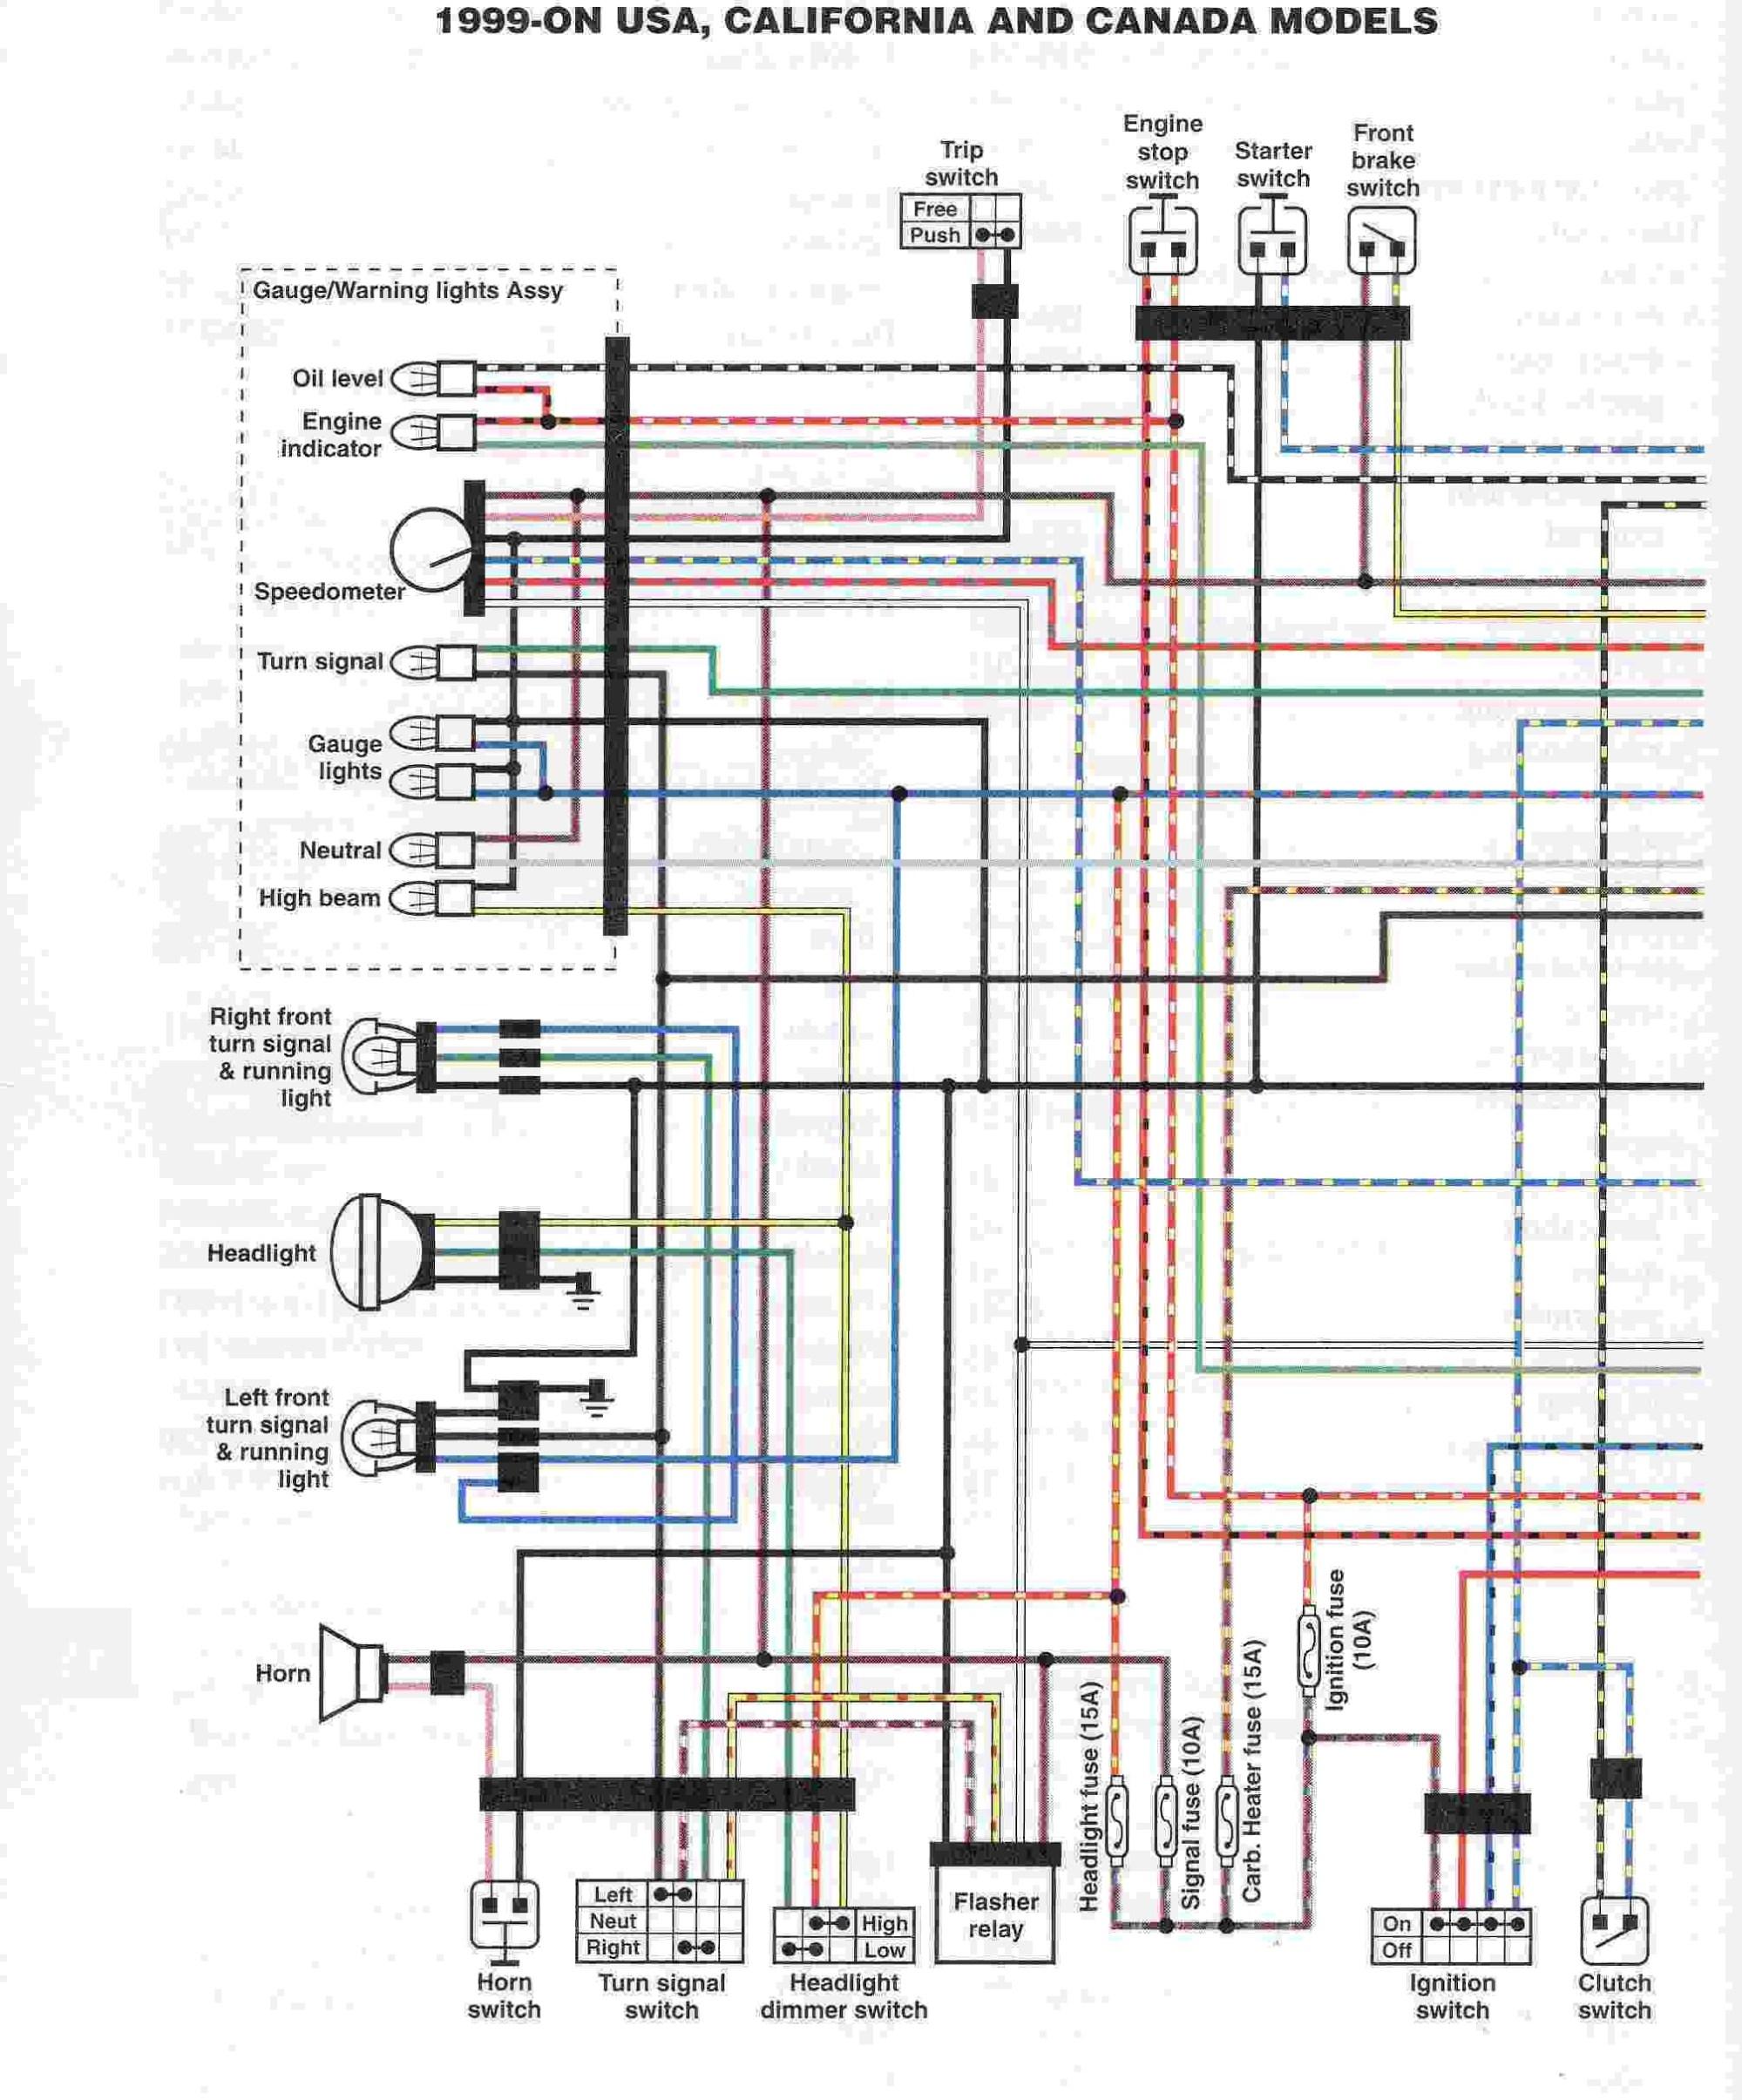 hight resolution of vega wiring diagram lights wiring diagram previewvega wiring diagram wiring diagram vega wiring diagram lights